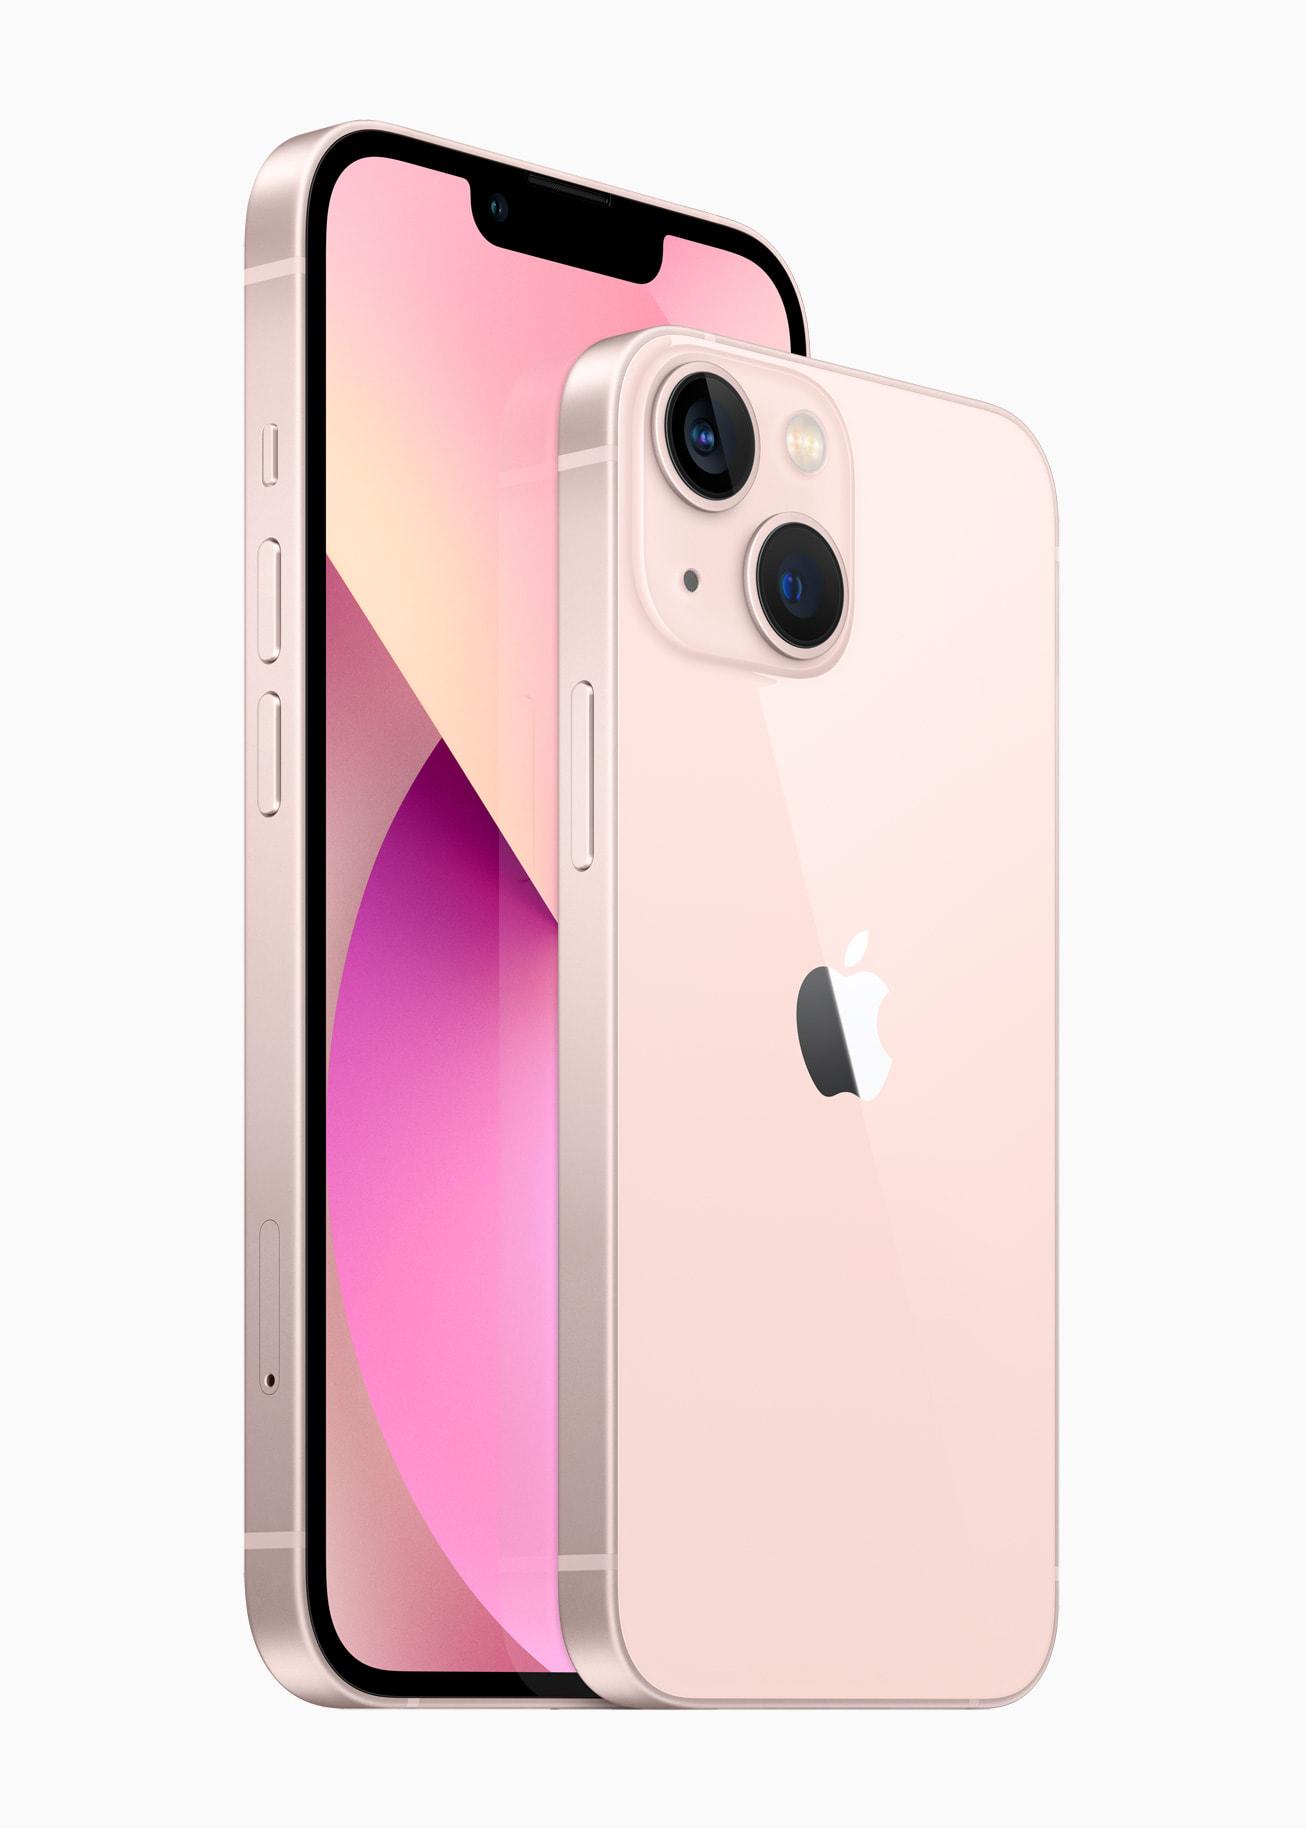 iPhone 13 & iPhone 13 Mini